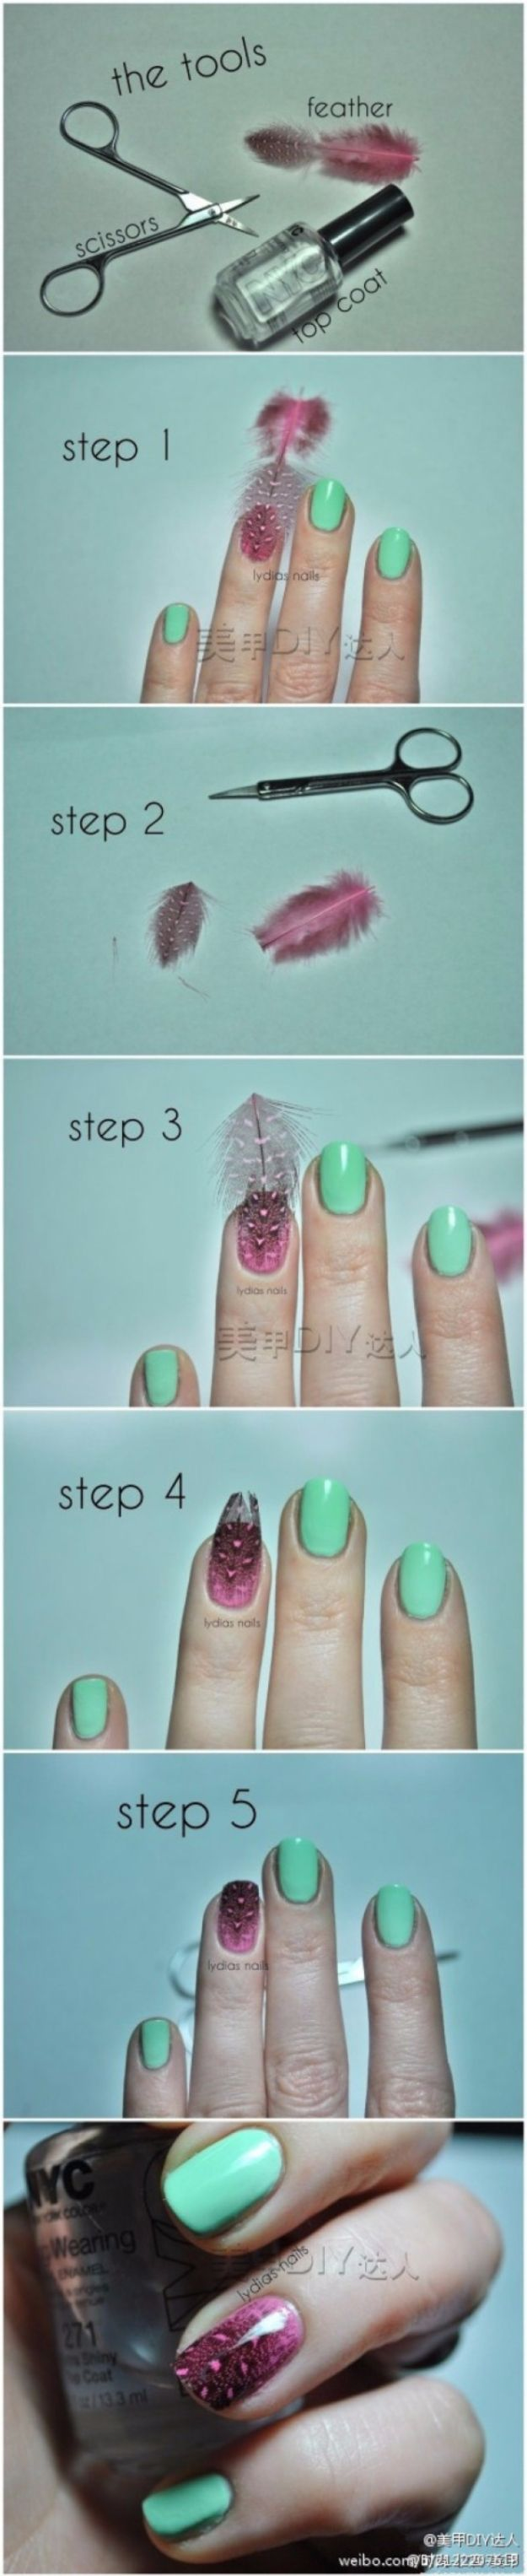 33 Unbelievably Cool Nail Art Ideas 30